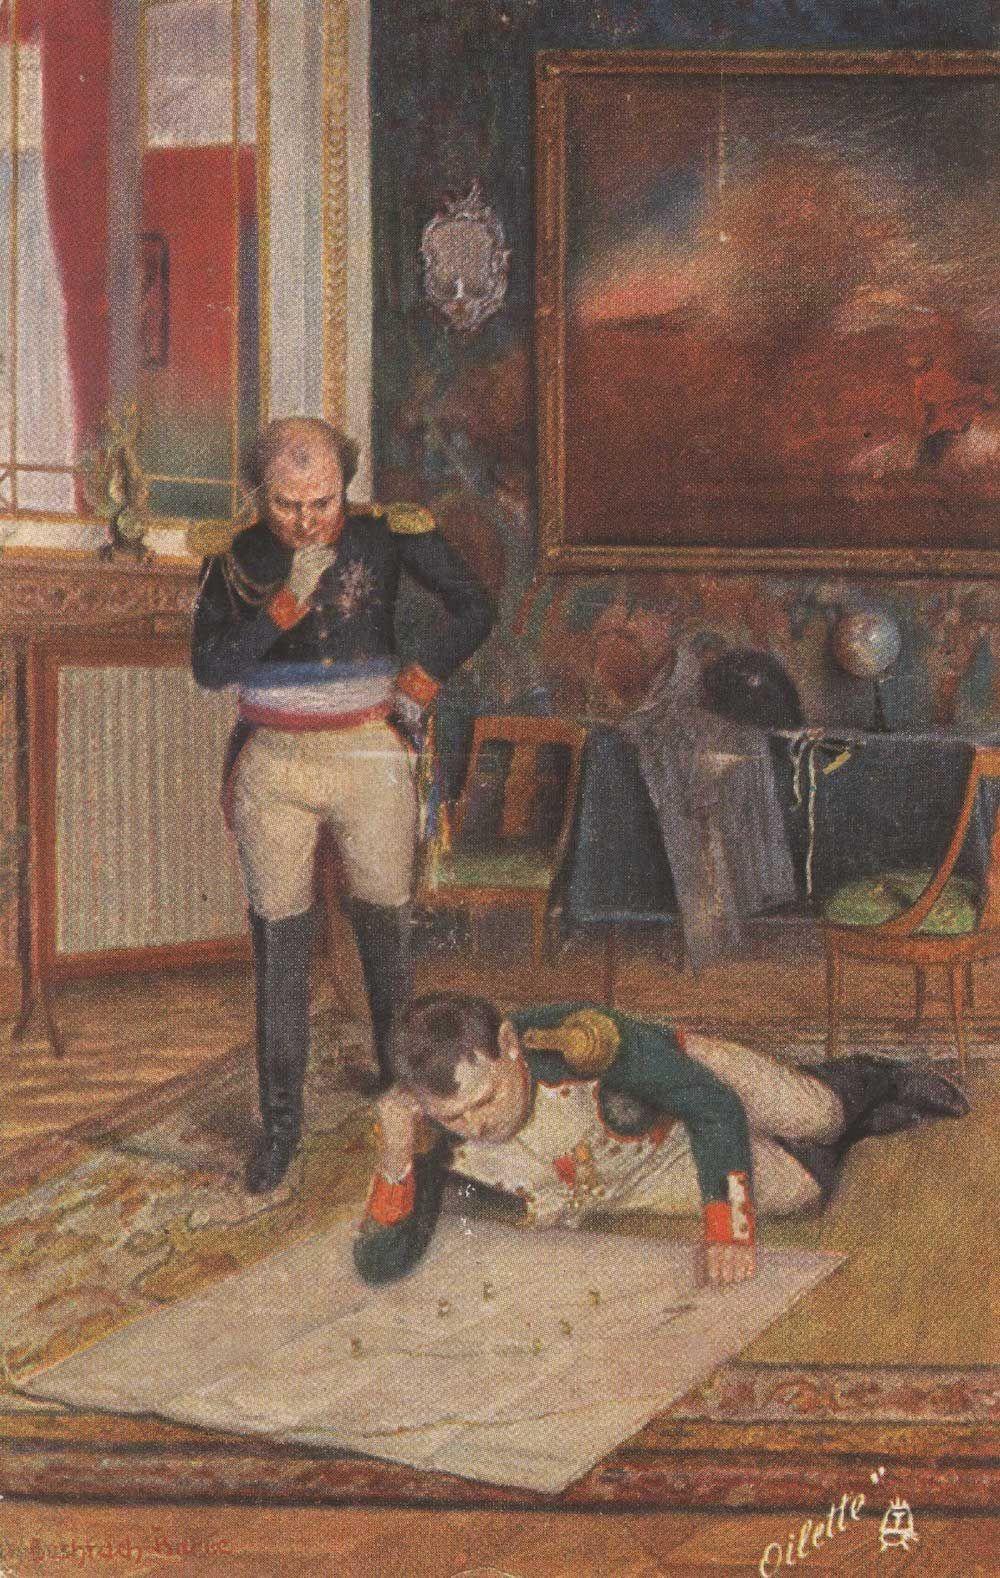 Fonte 1: cartolina raffigurante un dipinto di Emmanuel Bachrach-Barée, kollektion Moderne Meister, serie XVII Napoleon, Berlin 1910 circa, Tuck.